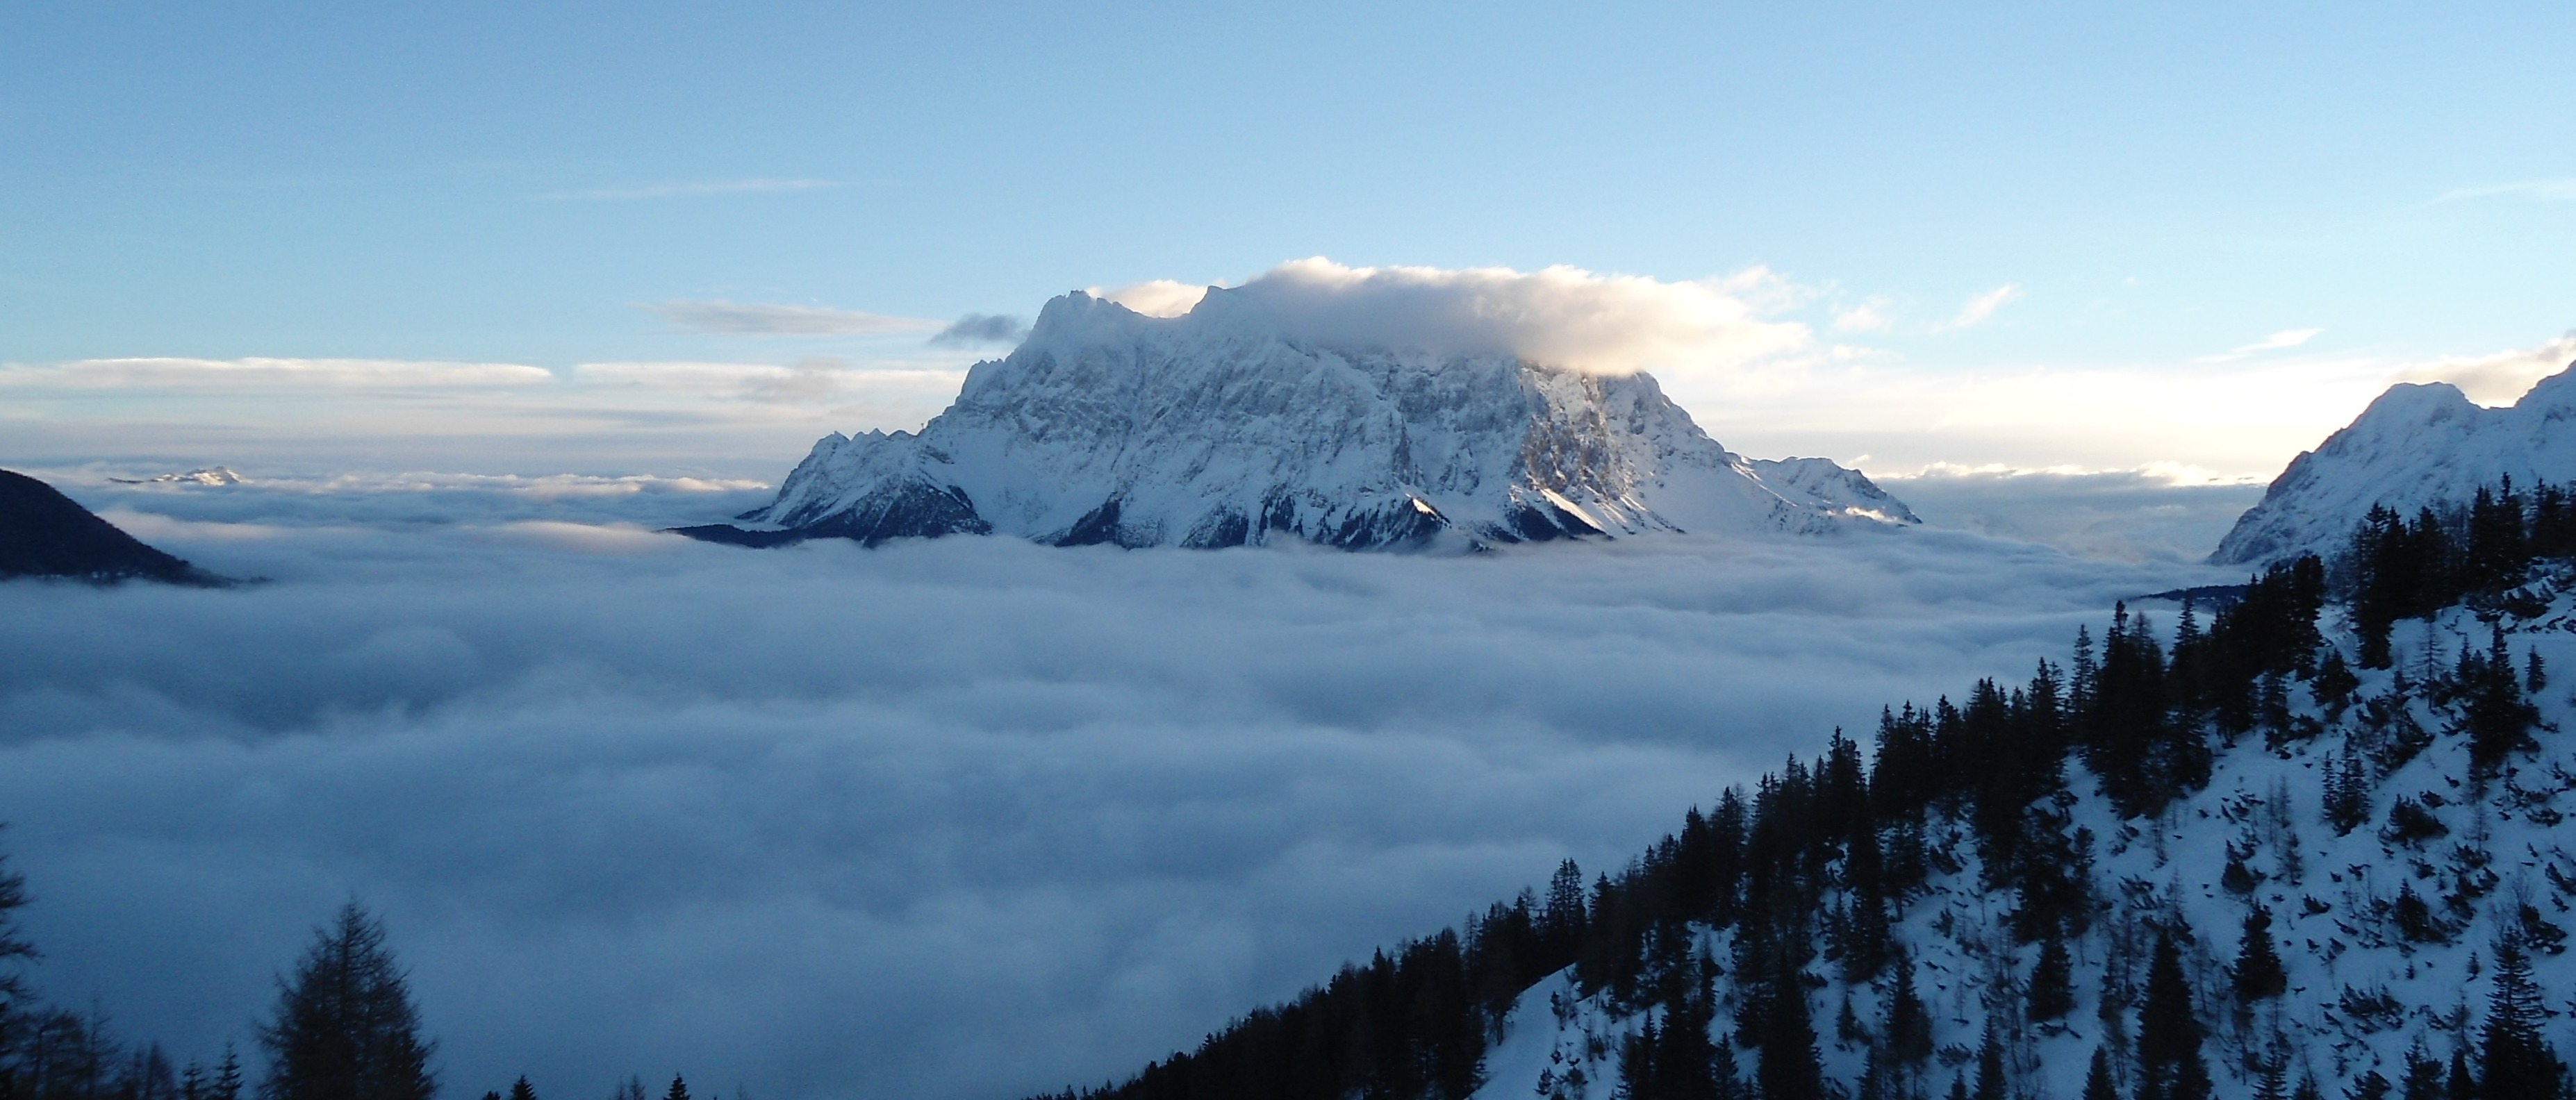 Zugspitze | domination of nature